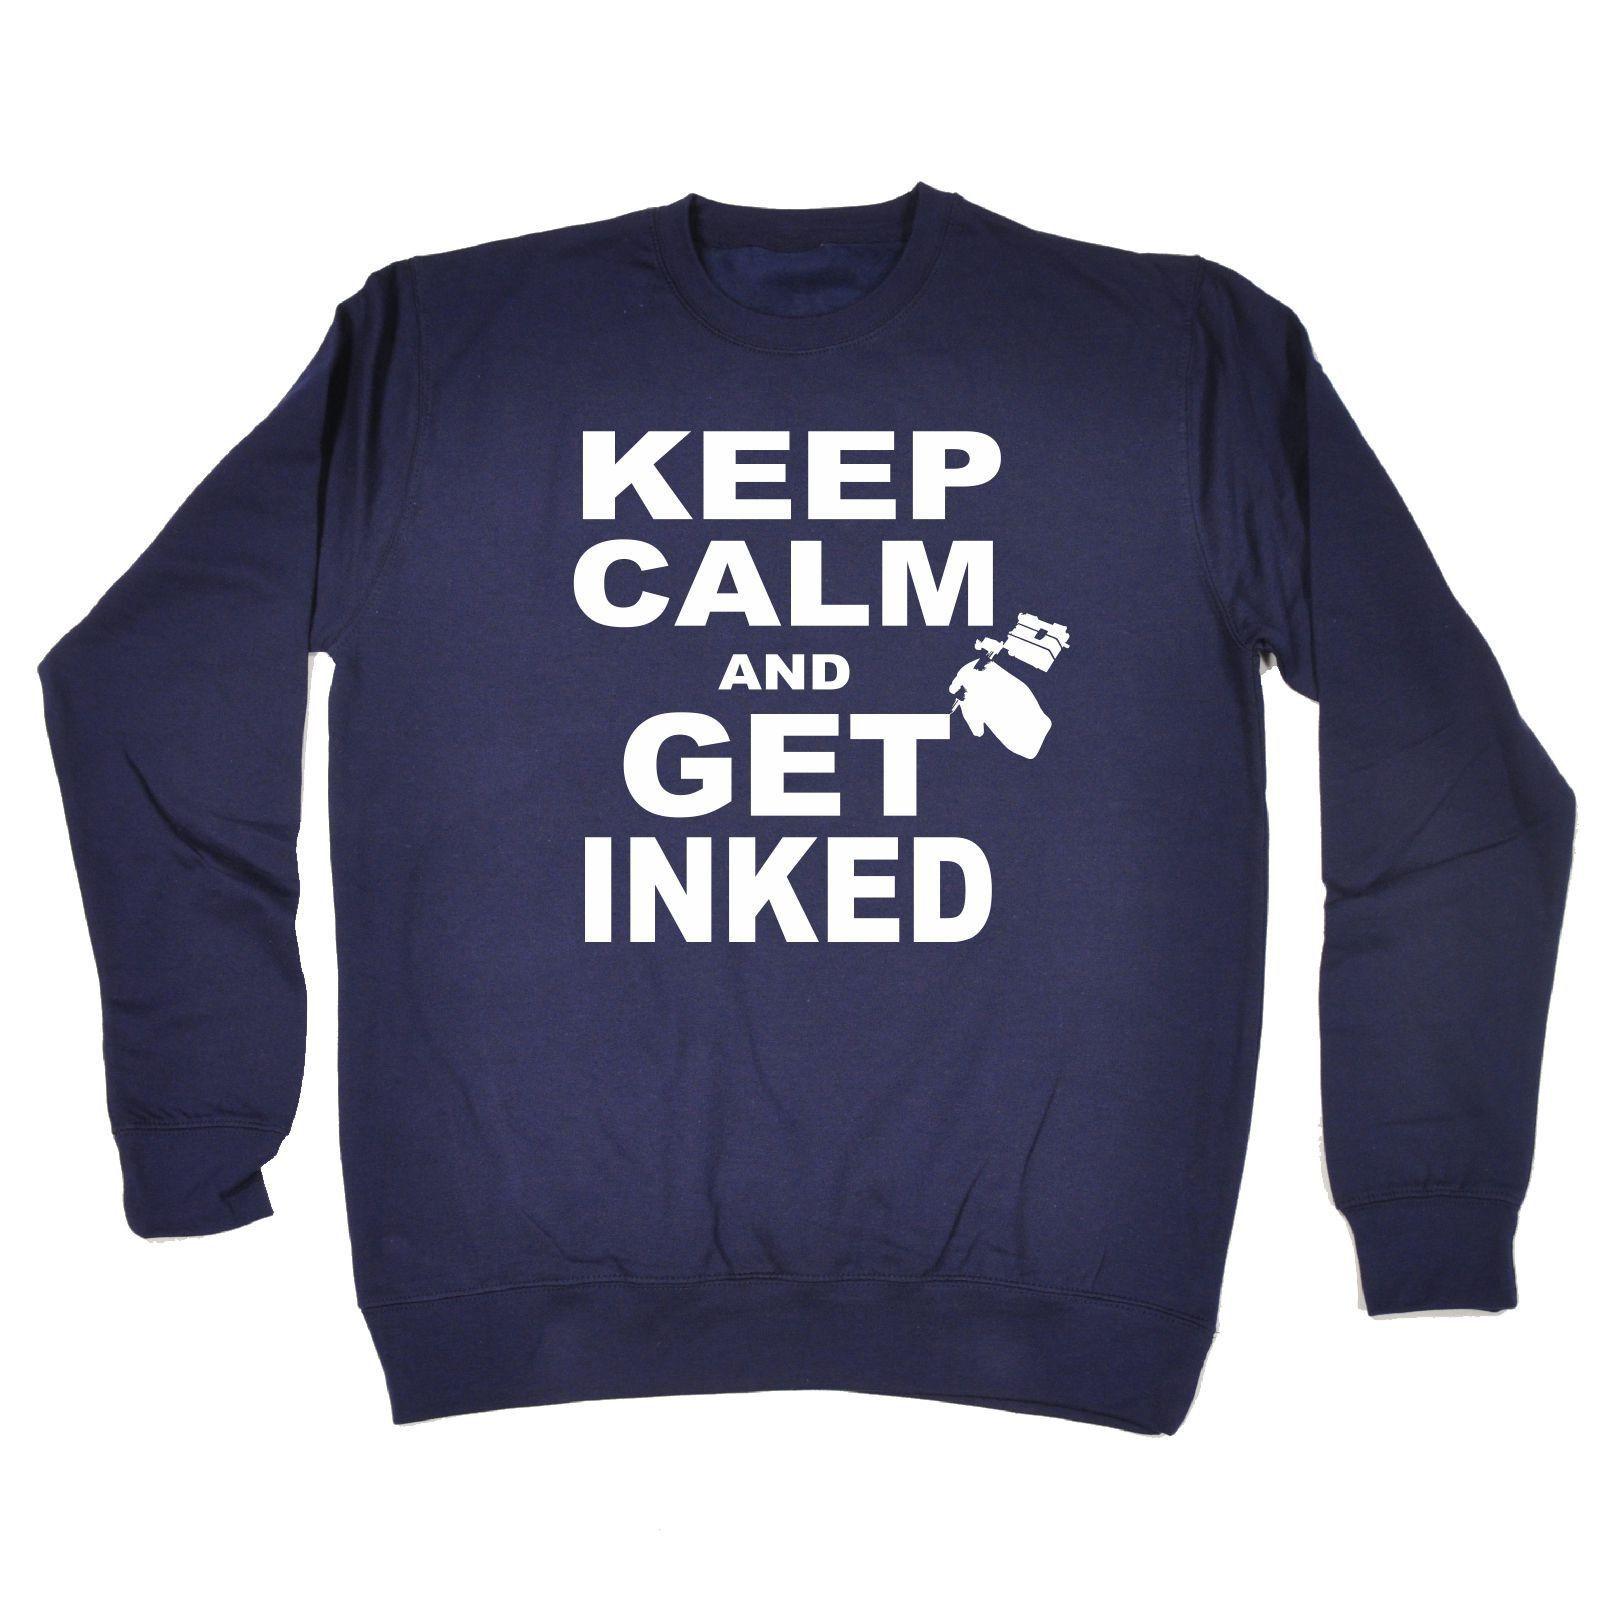 123t USA Keep Calm And Get Inked Funny Sweatshirt